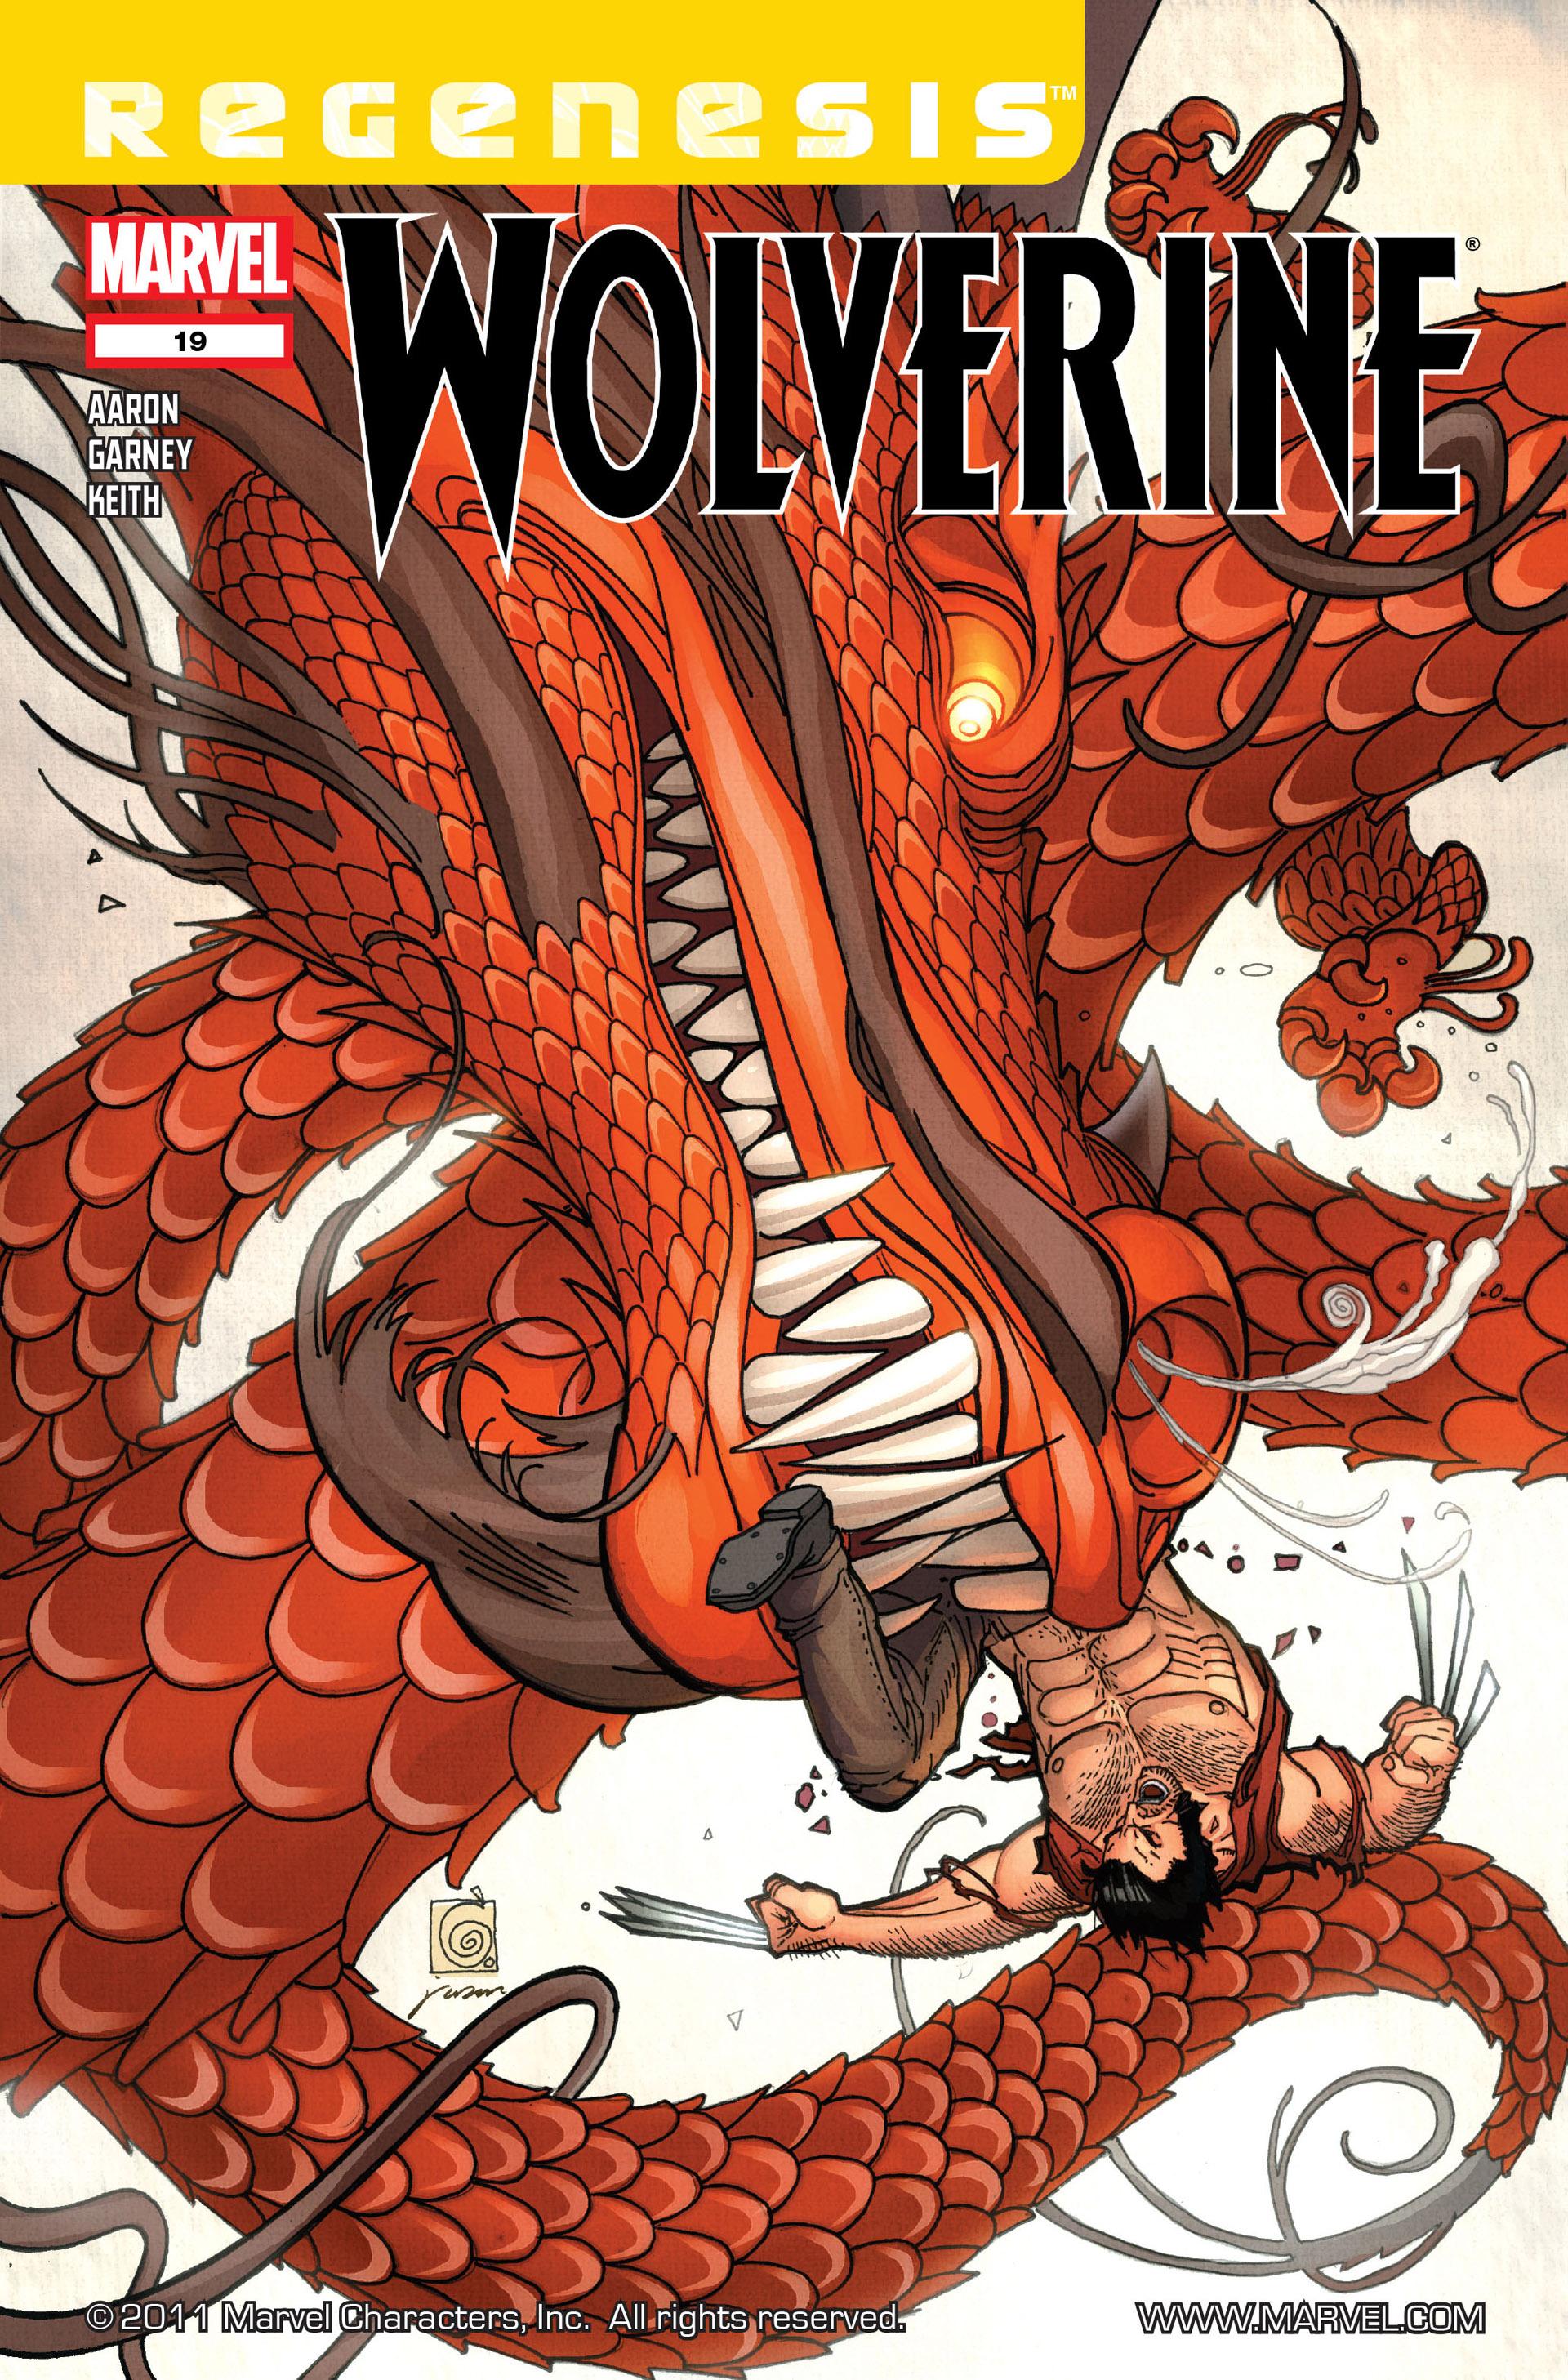 Wolverine (2010) 19 Page 1